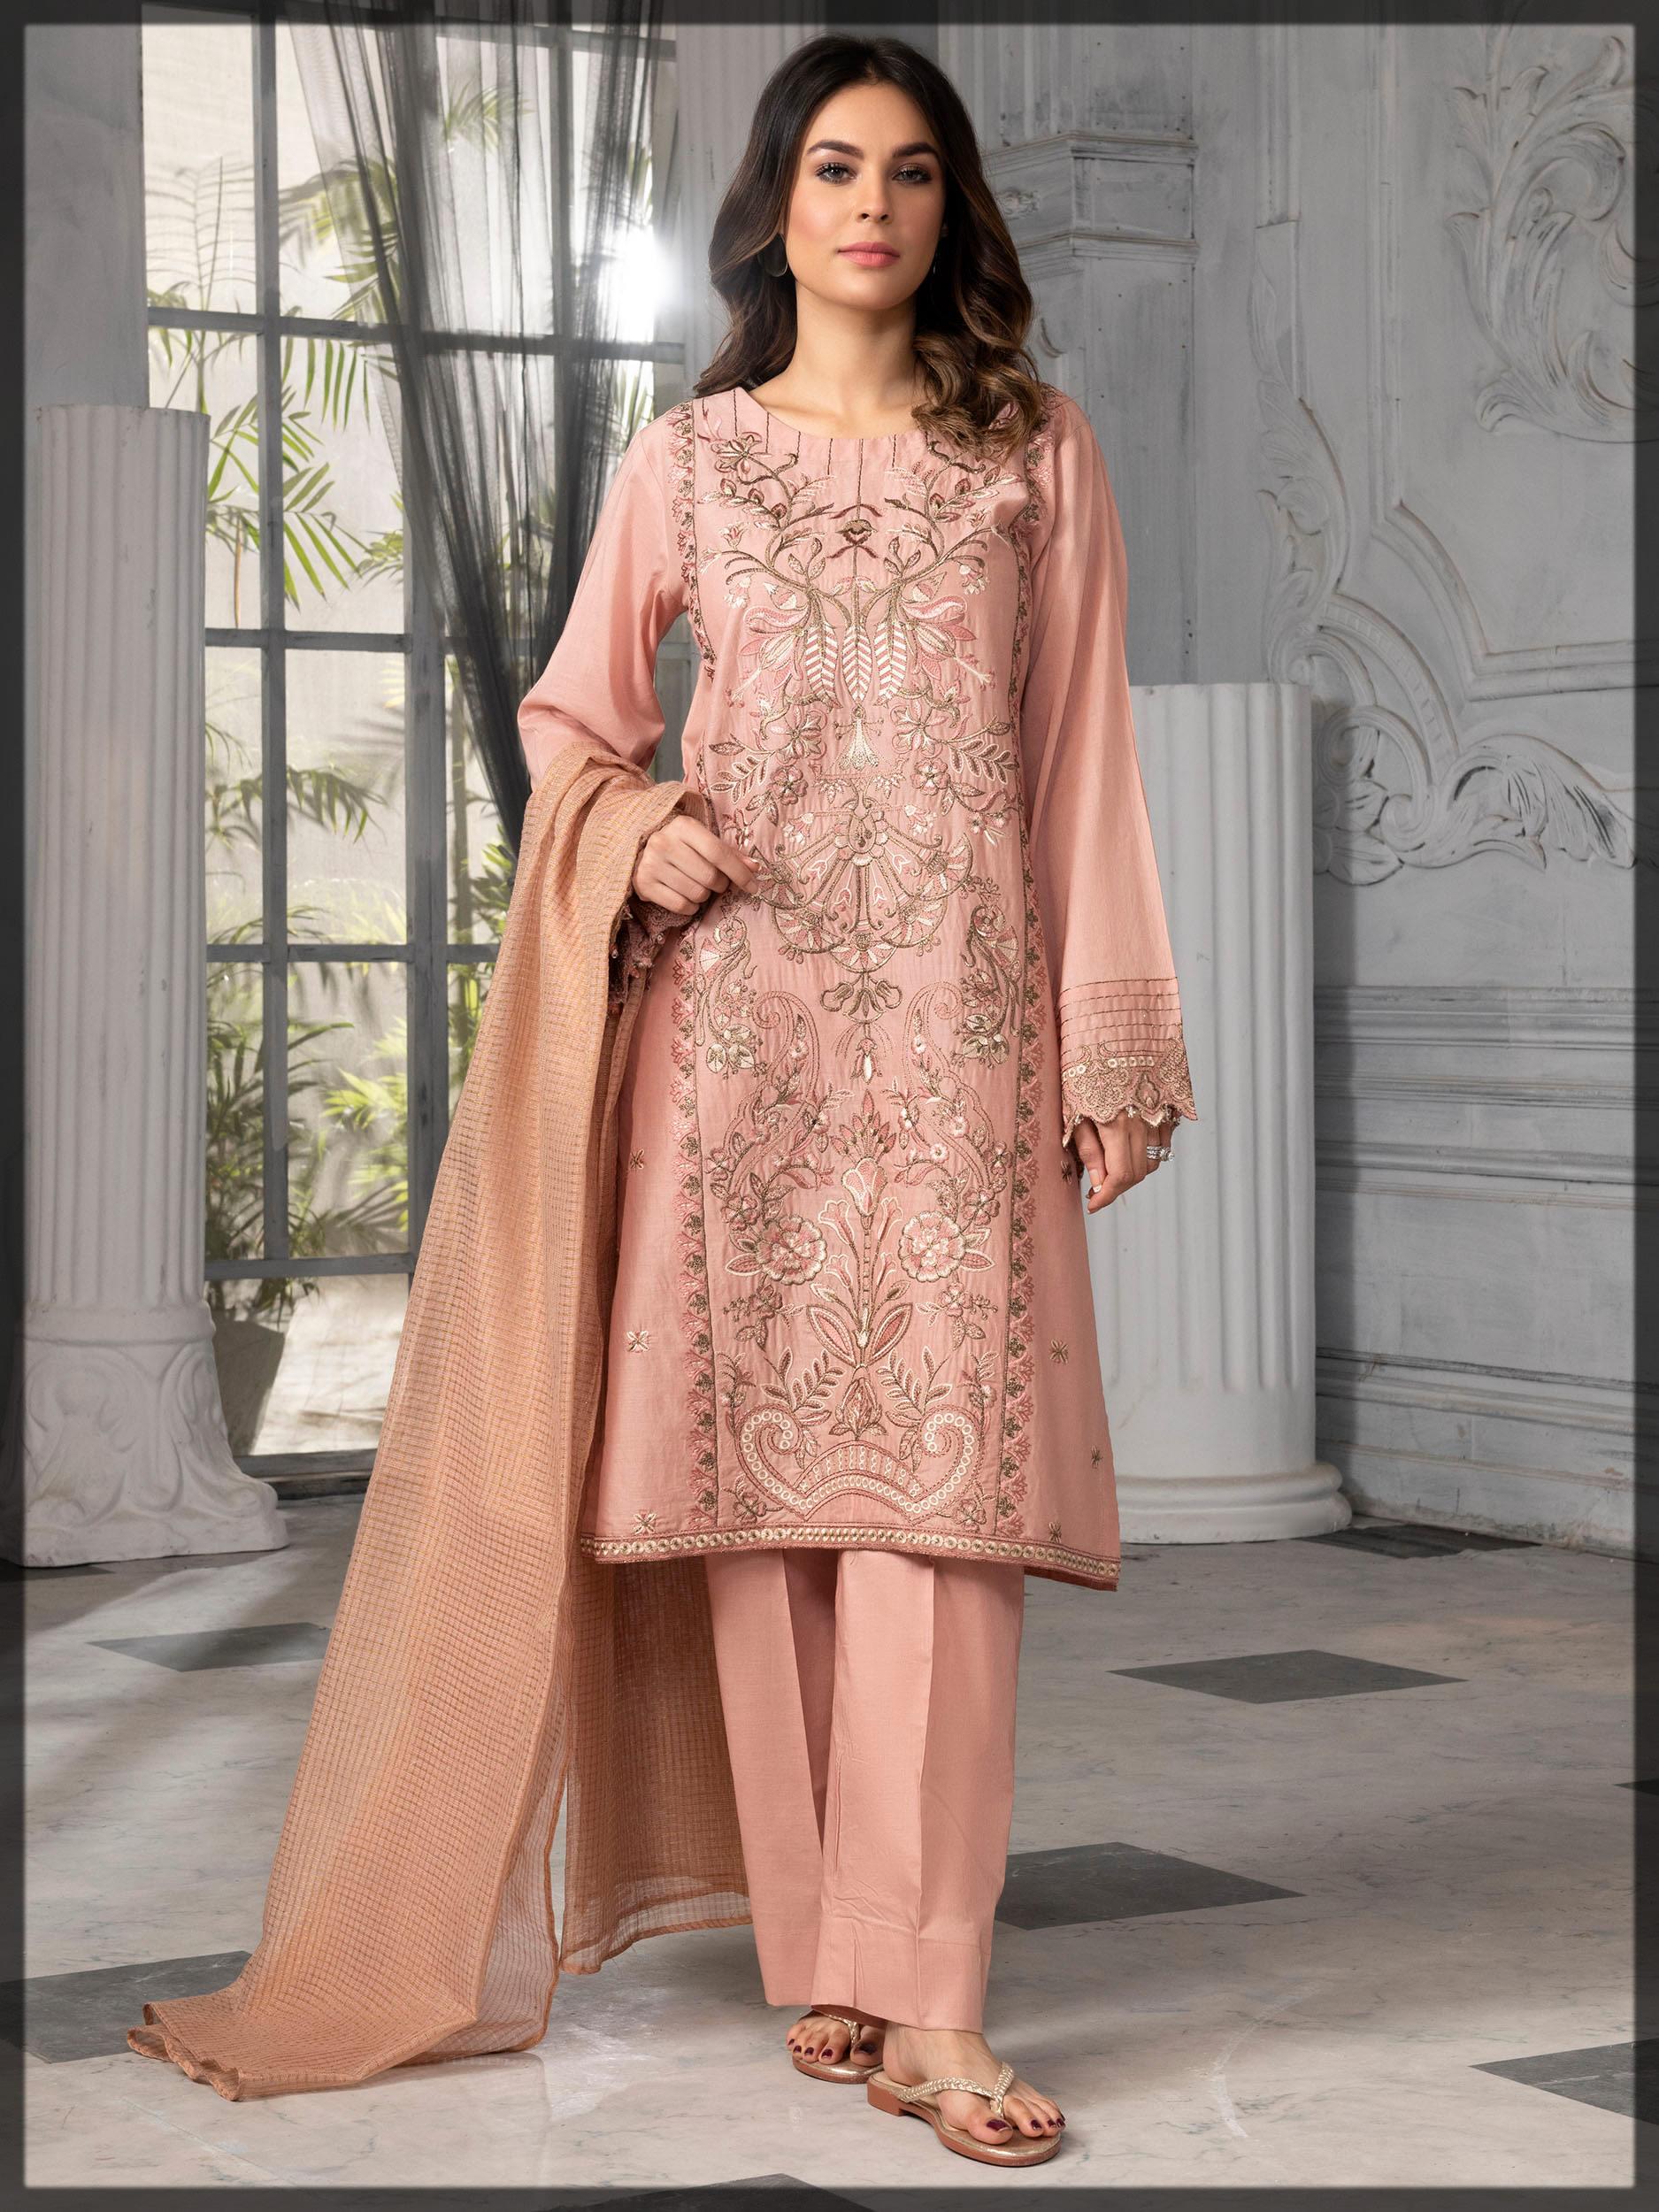 embellished pink lawn suit